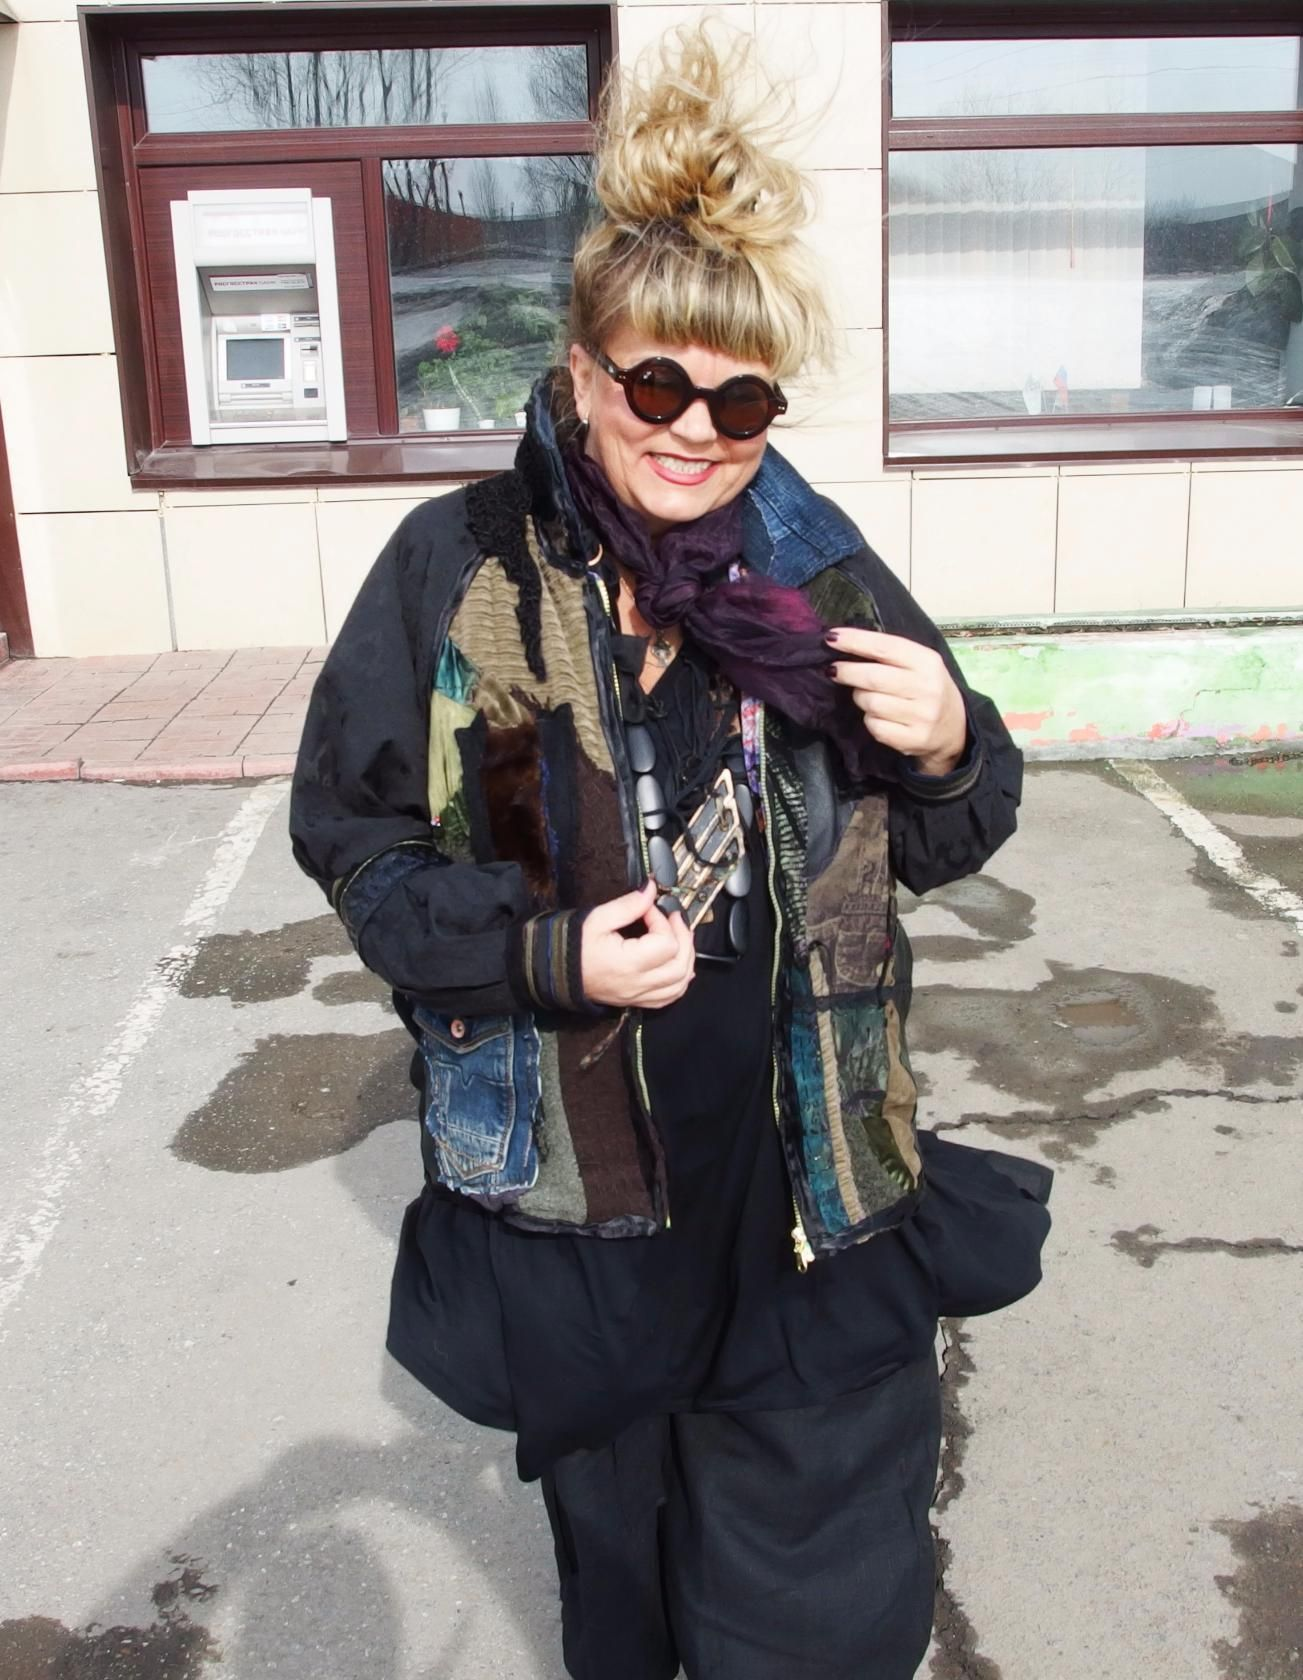 ОК Ольга Коньякова (Мельниченко) Омск    https://www.instagram.com/olgakonyakova/